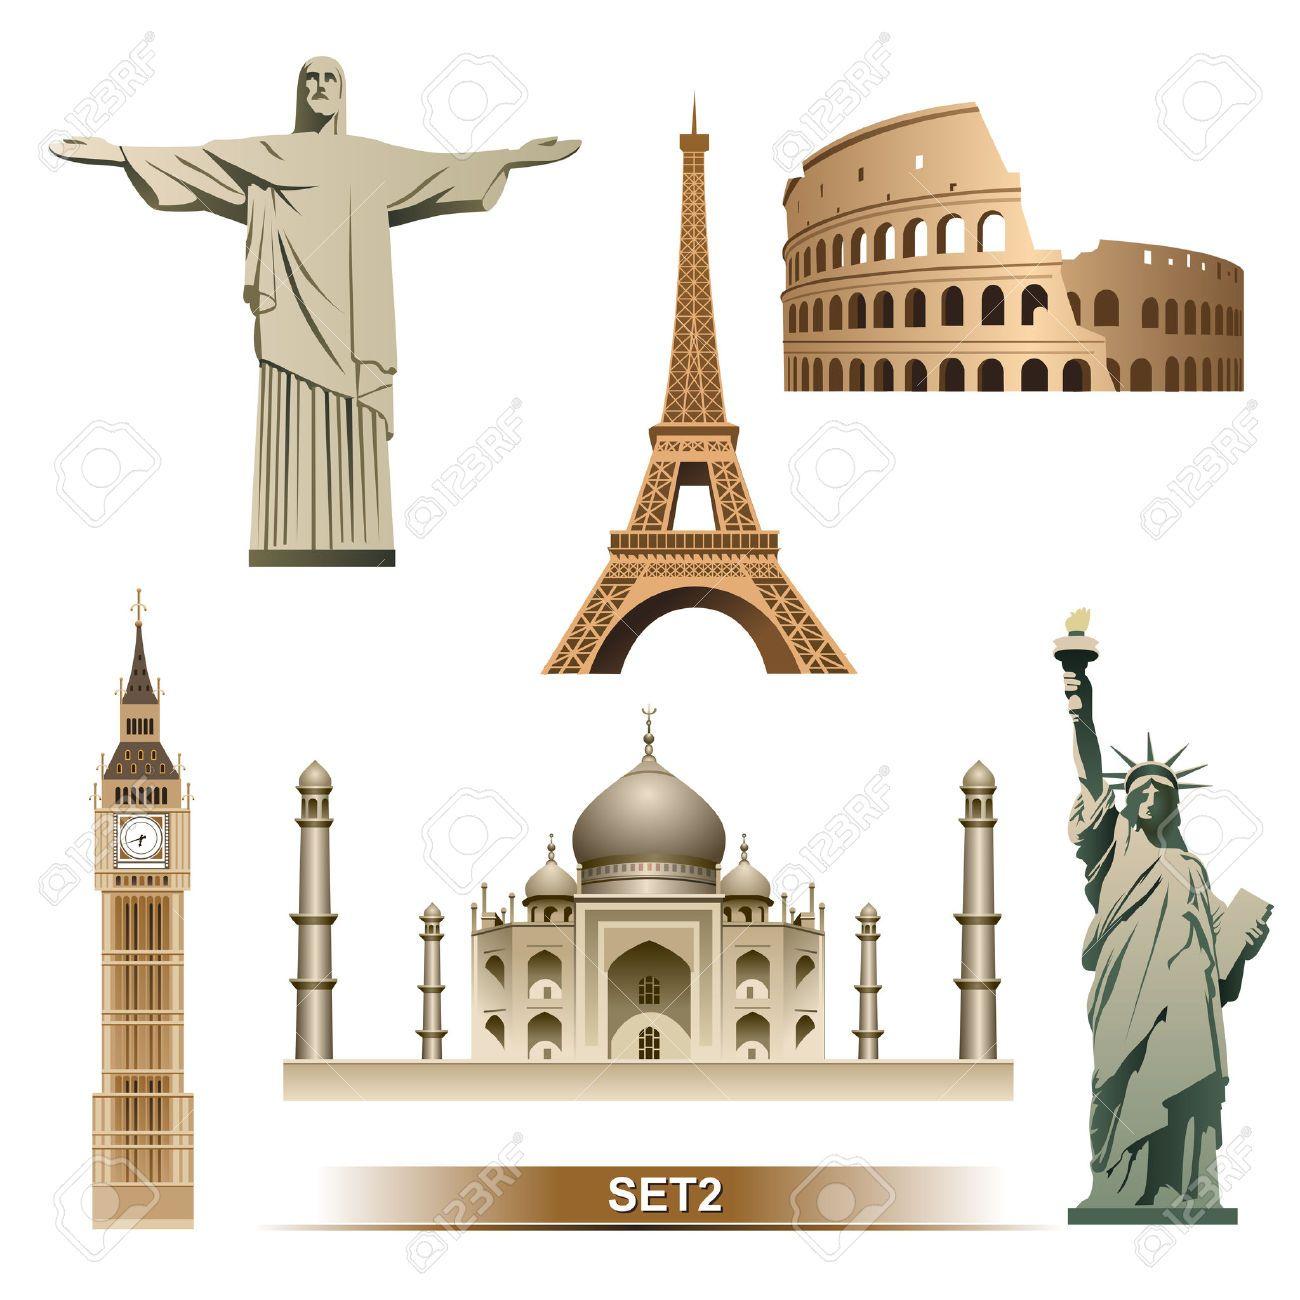 famous landmarks of the world clip art images.